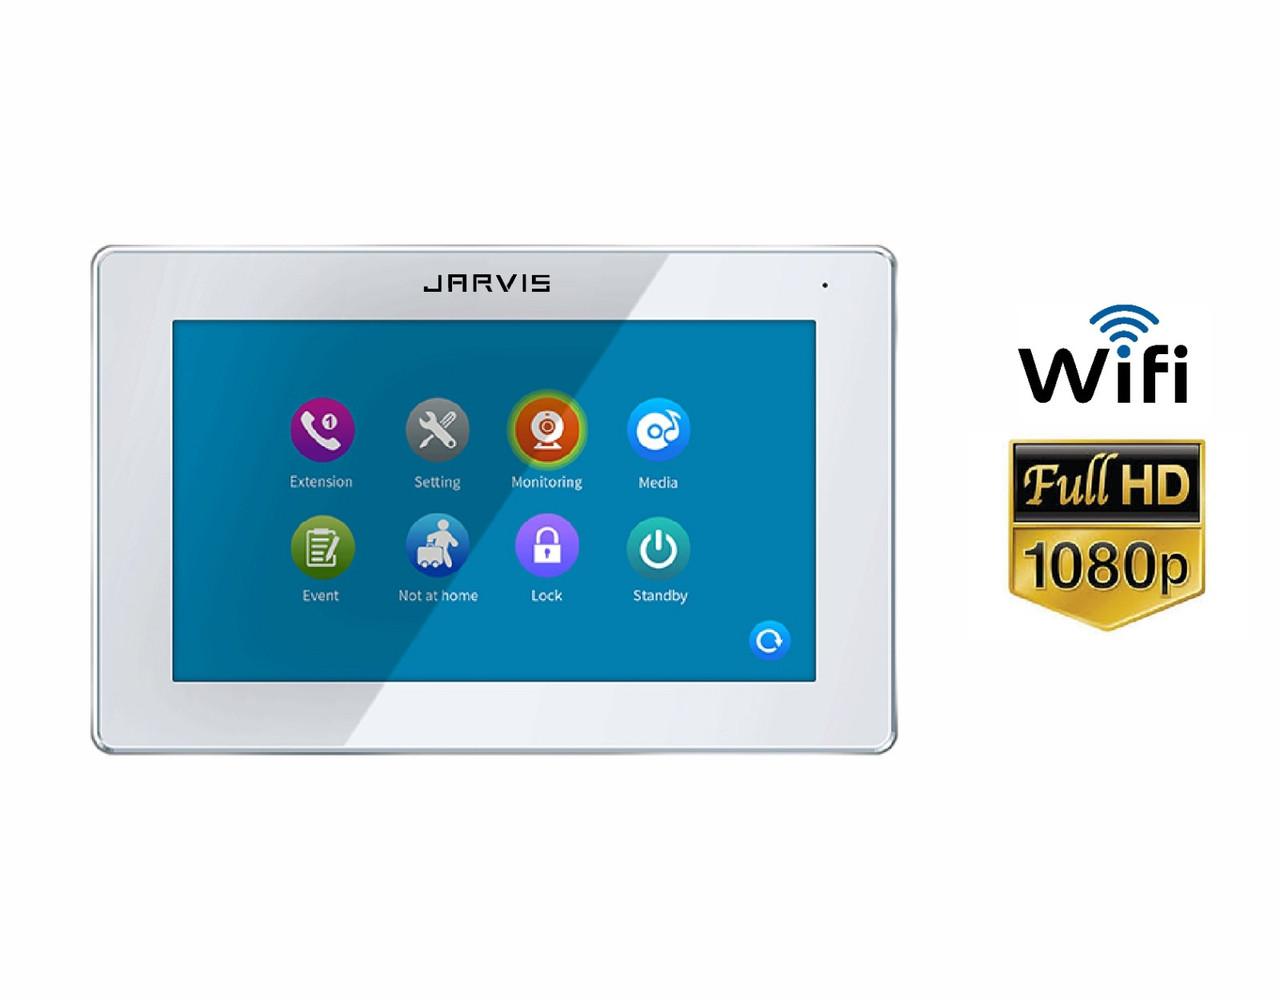 Touch Screen Full HD 1080P Відеодомофон з записом відео по-руху Jarvis JS-7TSW FullHD + WiFi